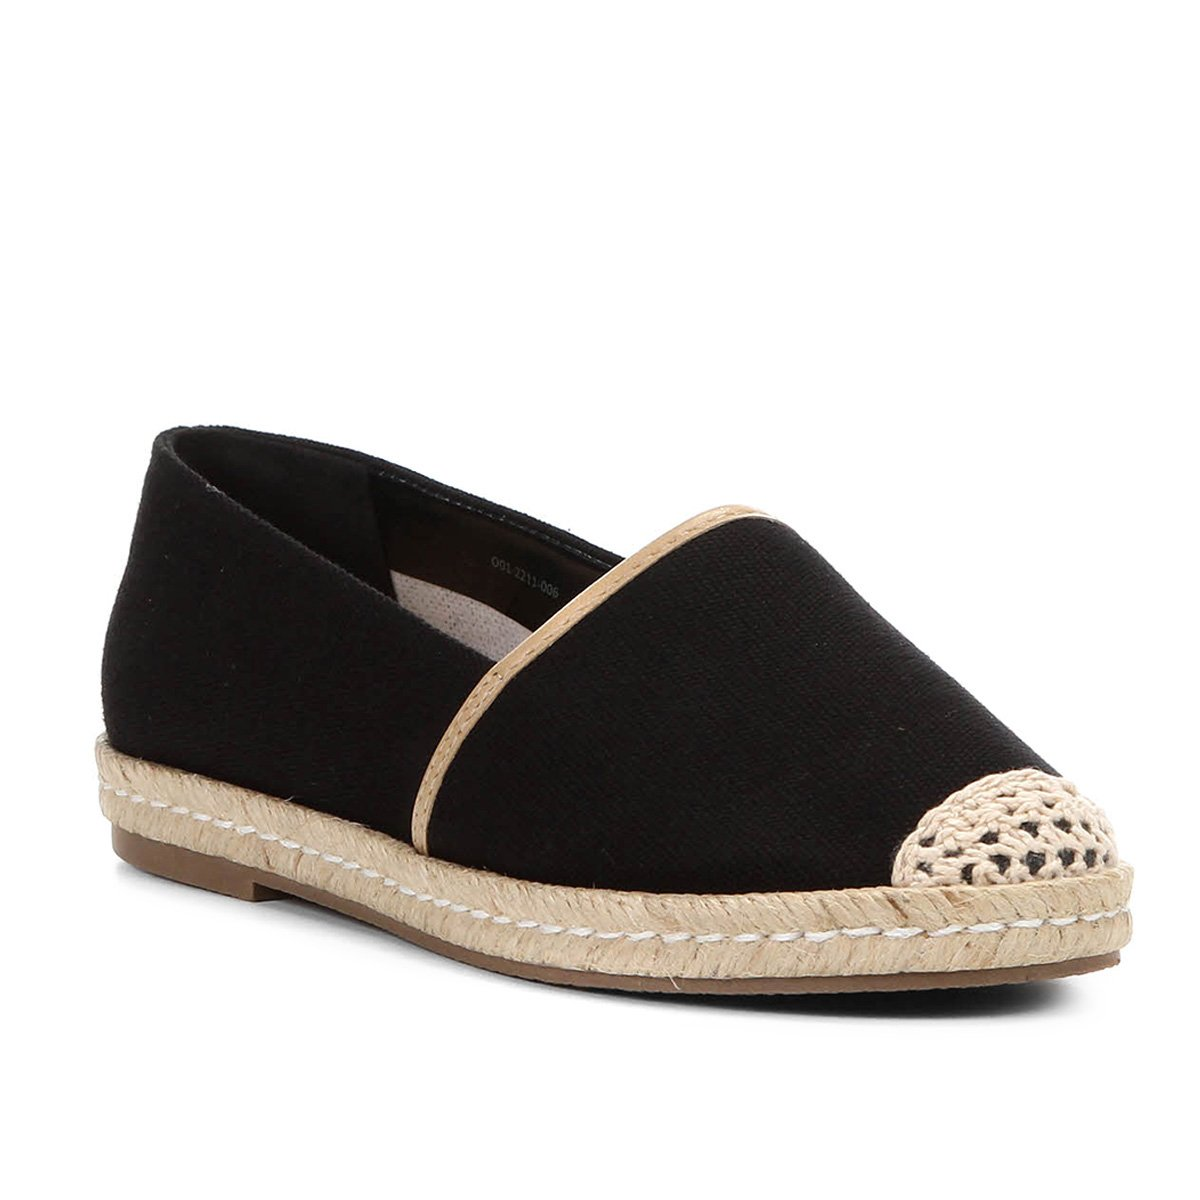 19b8ccbcbb2 Sapatilha Shoestock Espadrille Corda Feminina - Preto - Compre Agora ...